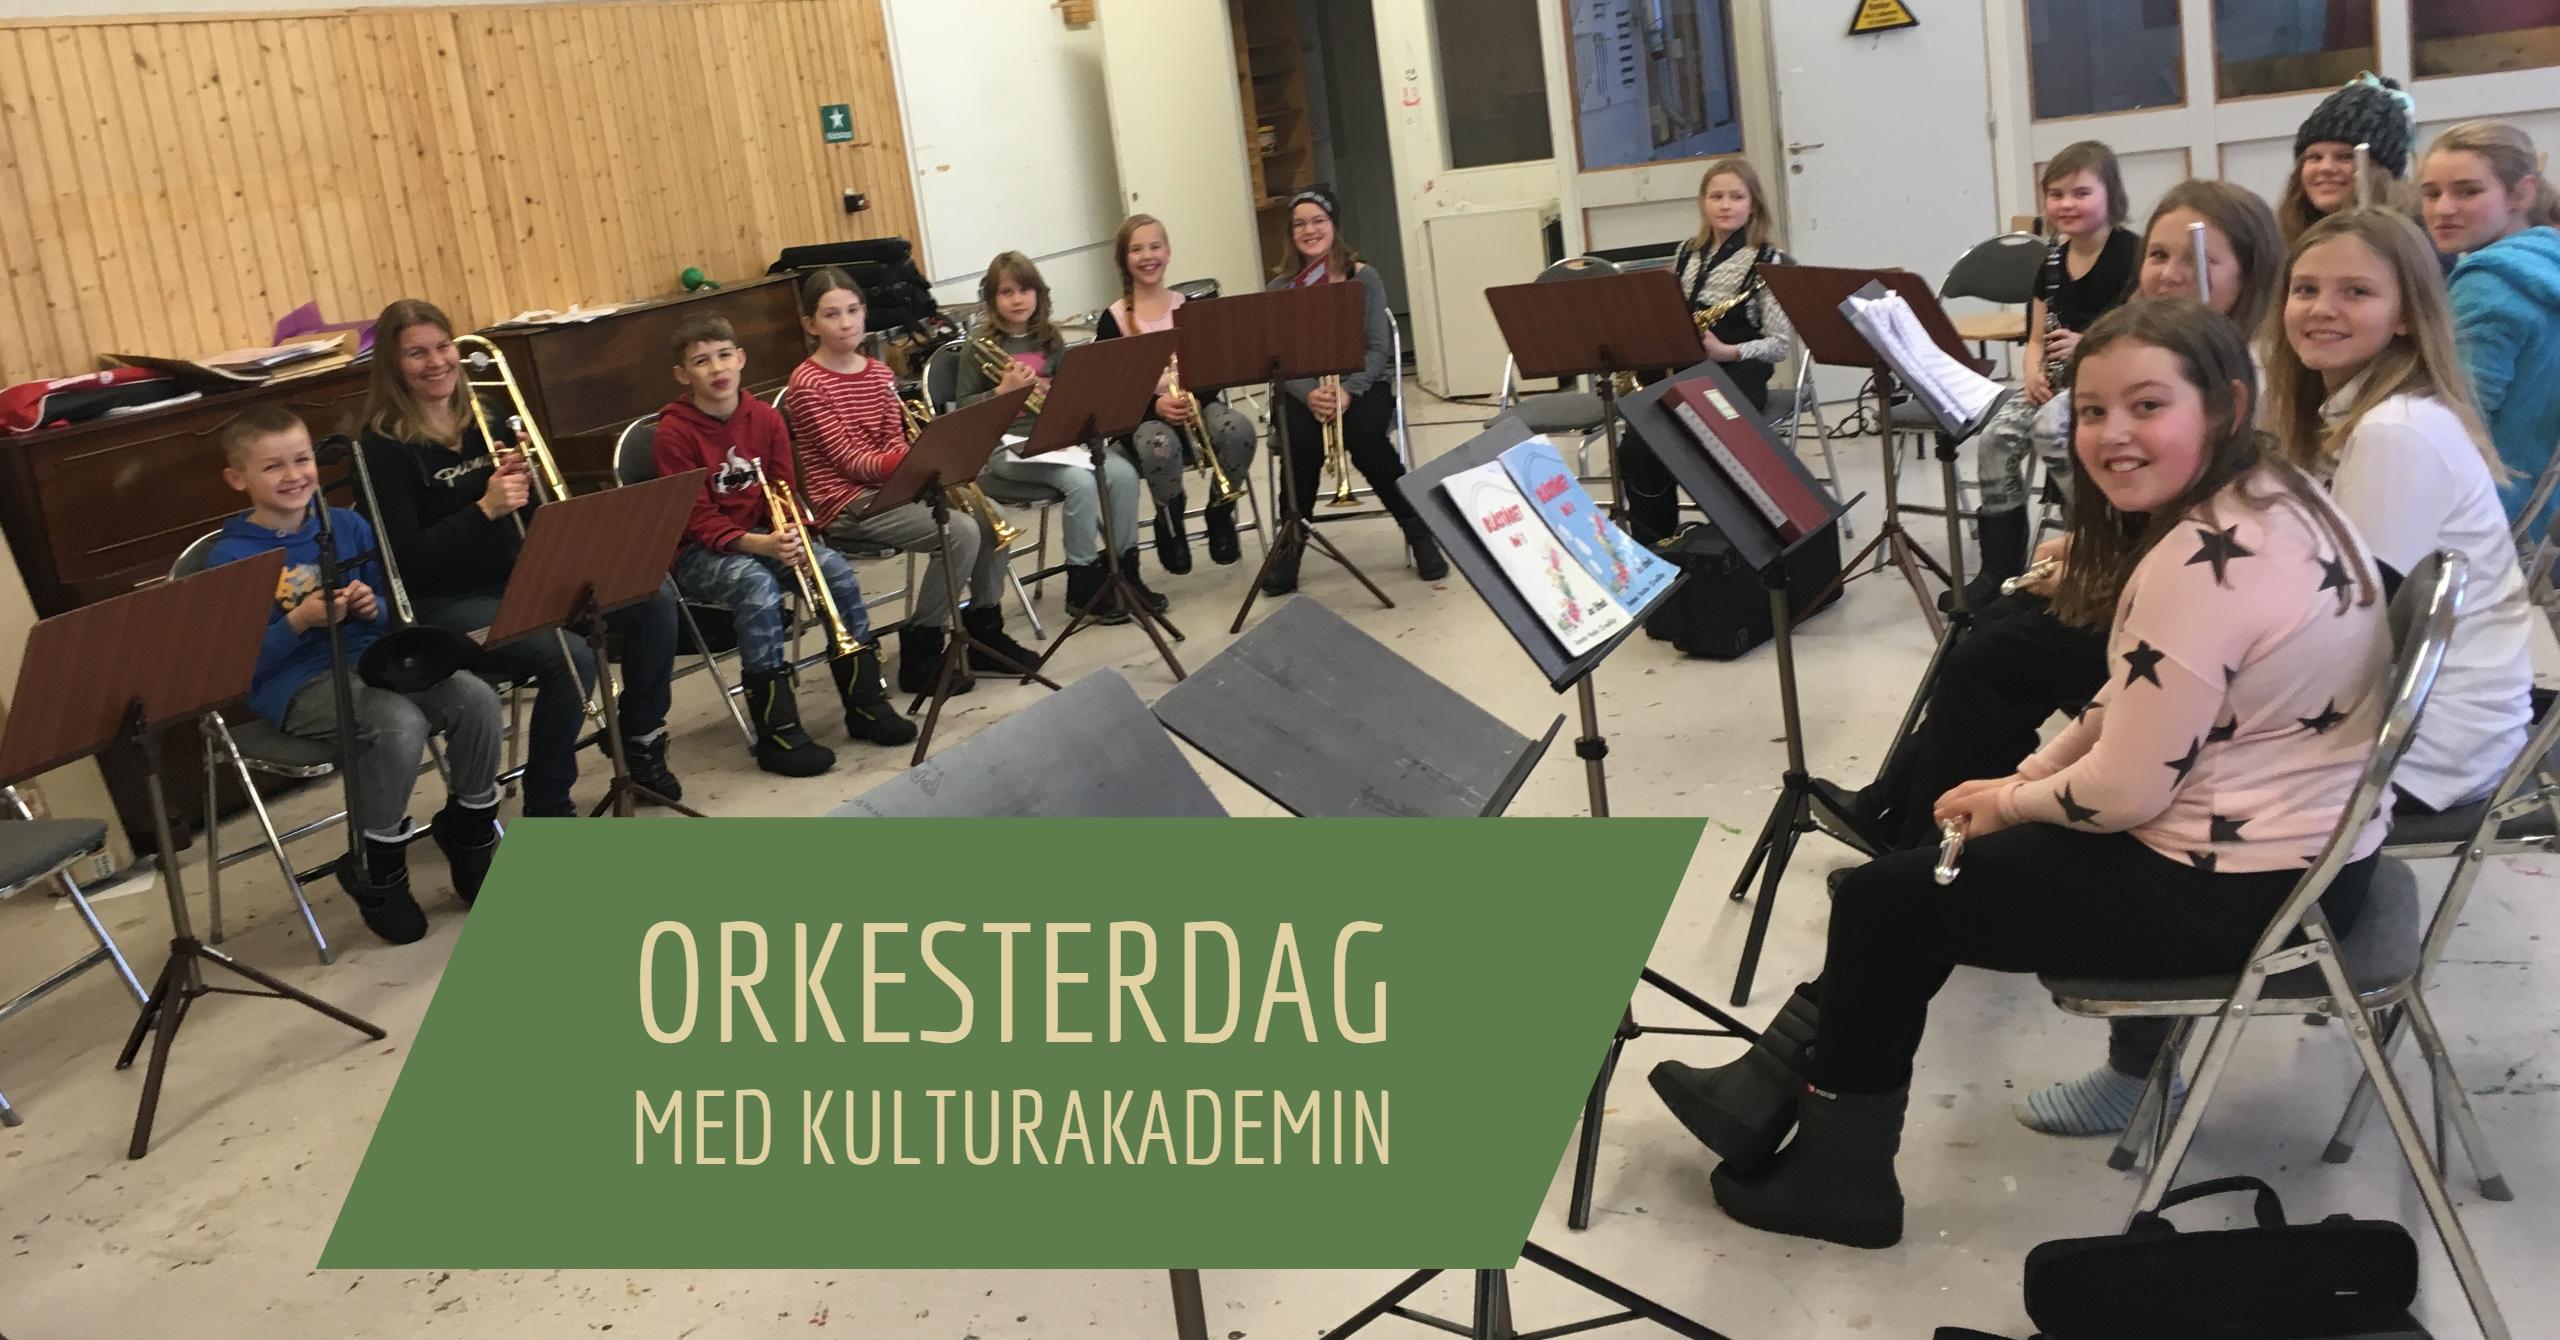 Orkesterdag 22/11 2016